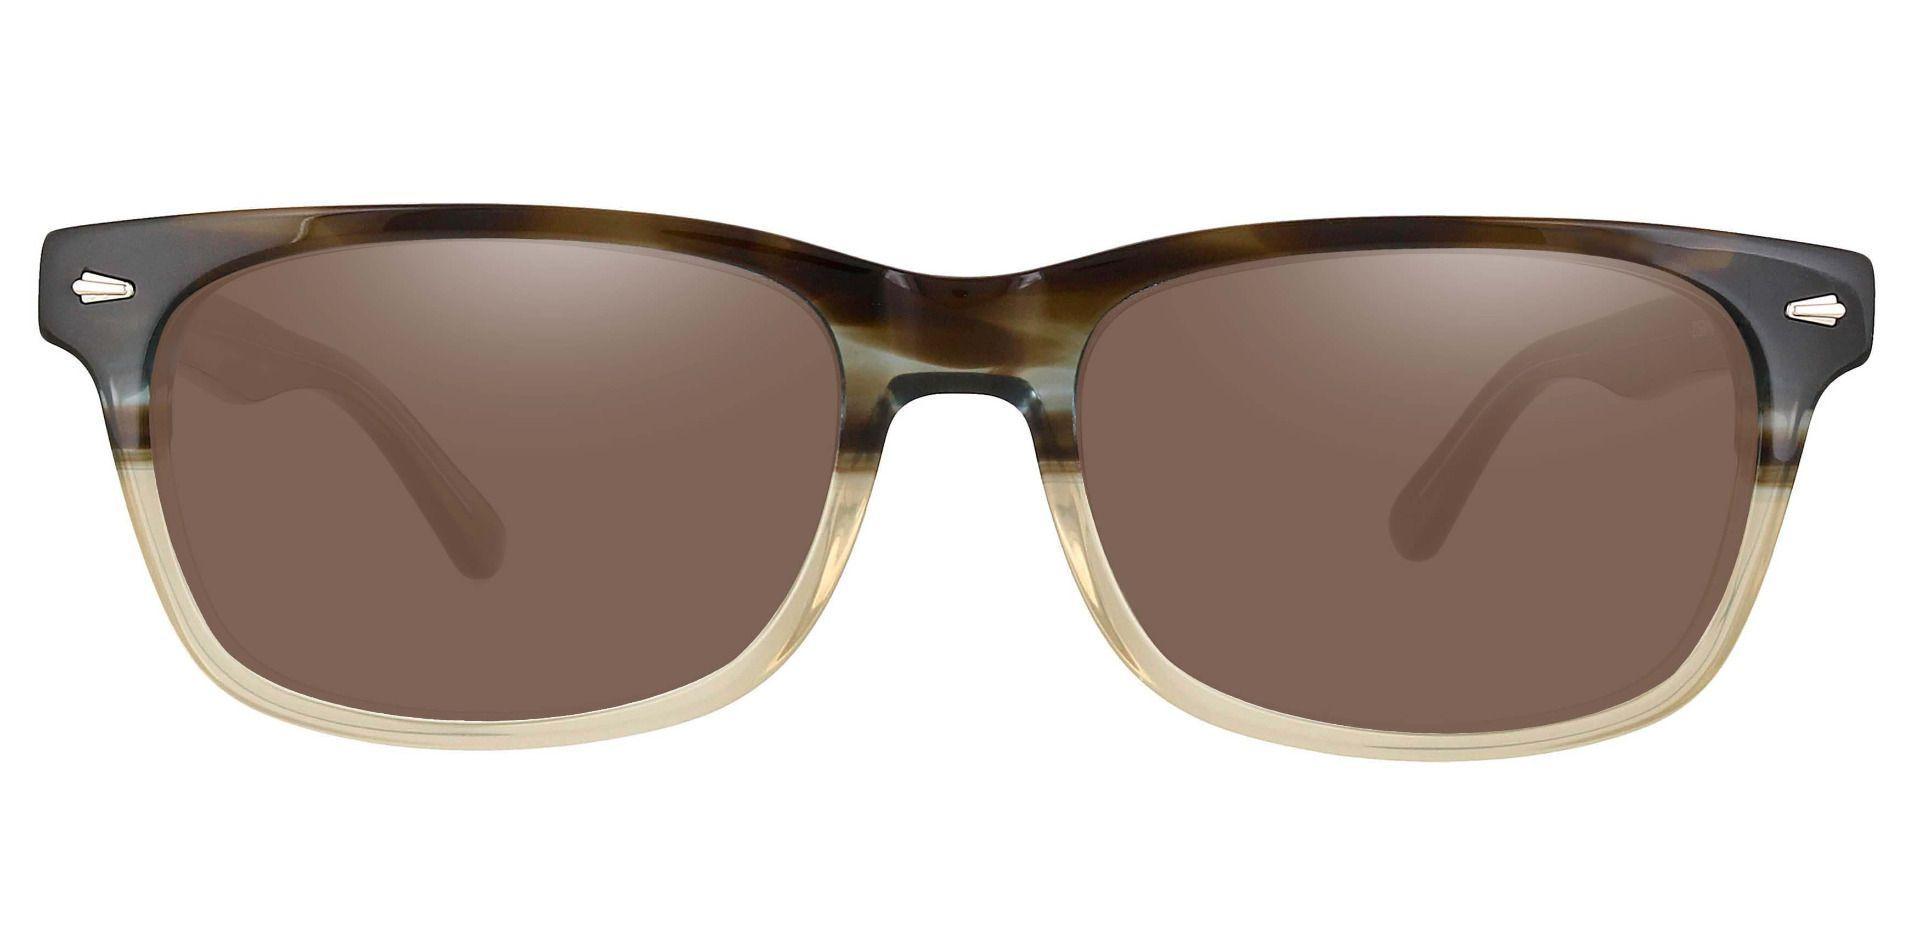 Hendrix Rectangle Progressive Sunglasses - Multi Color Frame With Brown Lenses